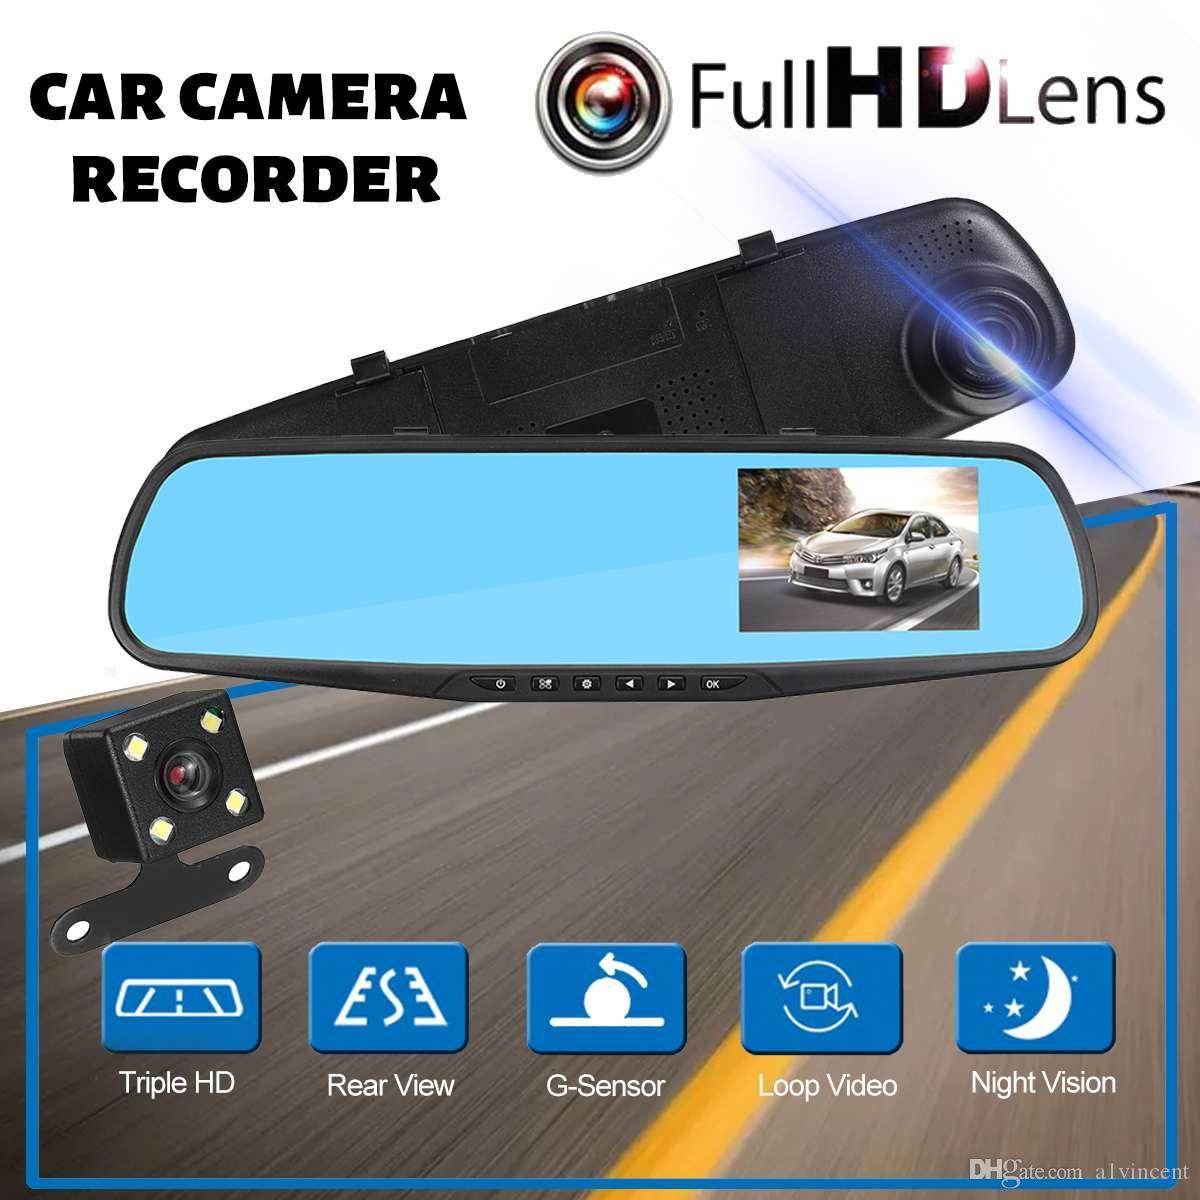 30PCS دي إتش إل HD 1080P 4.3 الكاميرا IPS المزدوج مرآة الرؤية الخلفية سيارة DVR كاميرا فيديو مسجل Registrator اندفاعة كام للكشف عن سيارة